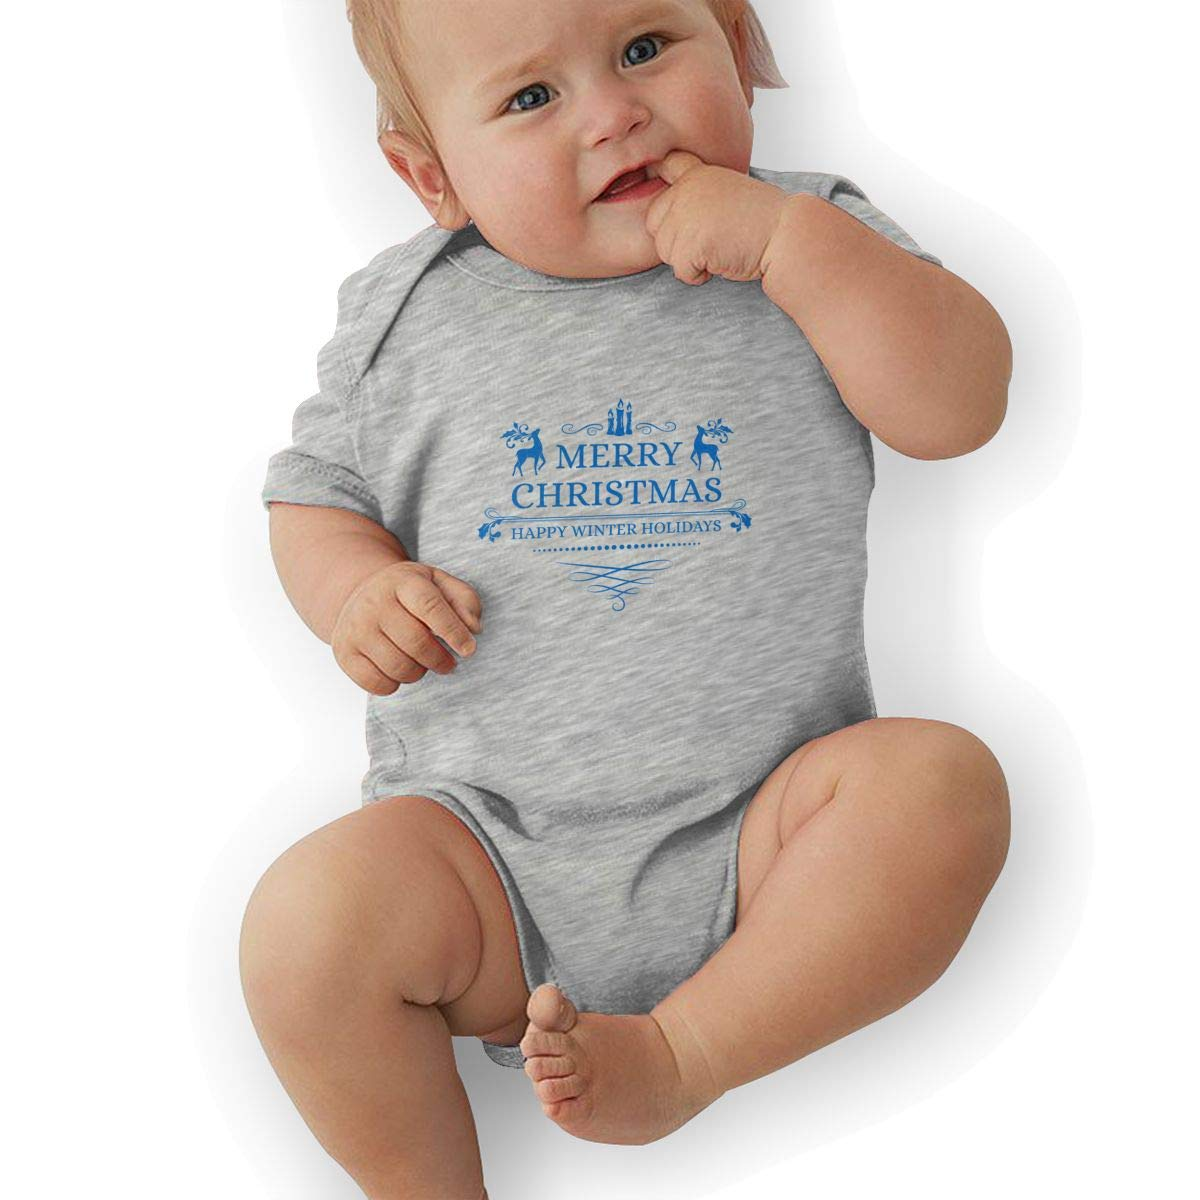 Toddler Baby Boys Bodysuit Short-Sleeve Onesie Merry Christmas Cool Logo Print Outfit Autumn Pajamas